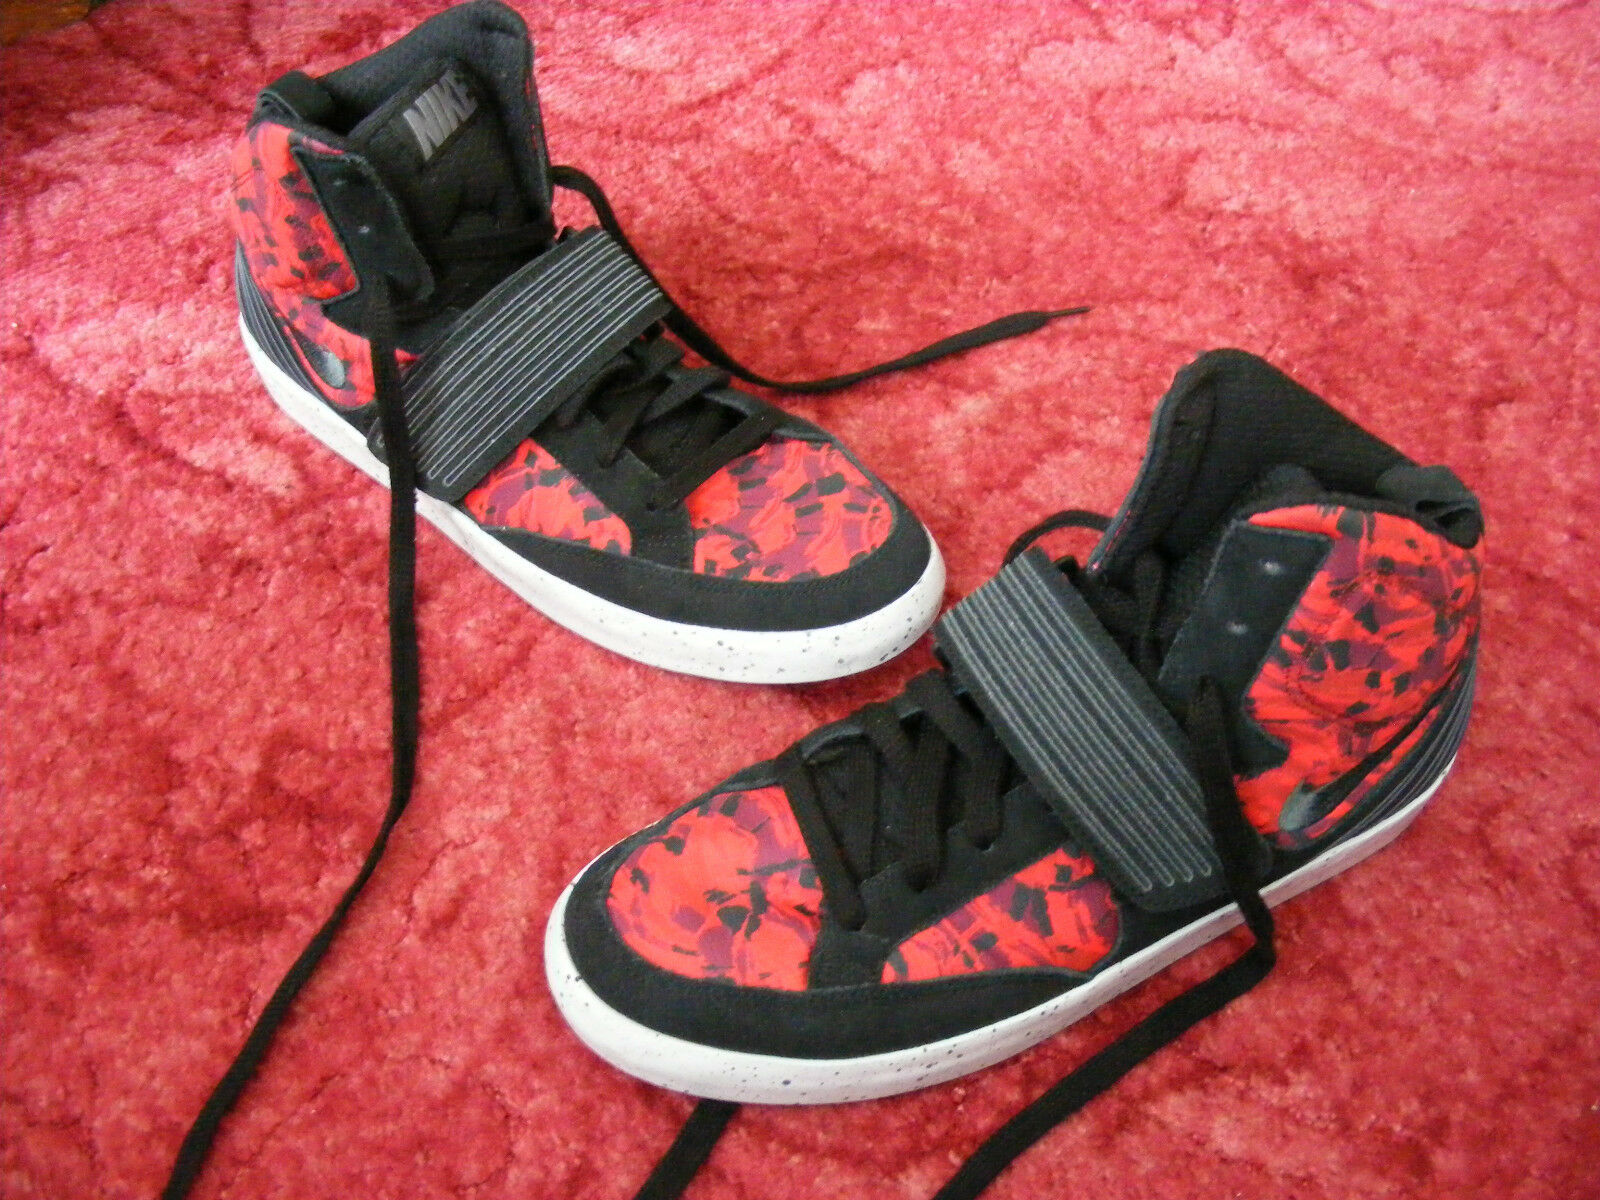 Para Hombre Hombre Para Nike NSW skystepper 599277 Hi Tops Botas Zapatillas tamaño nos 12 3c2c04